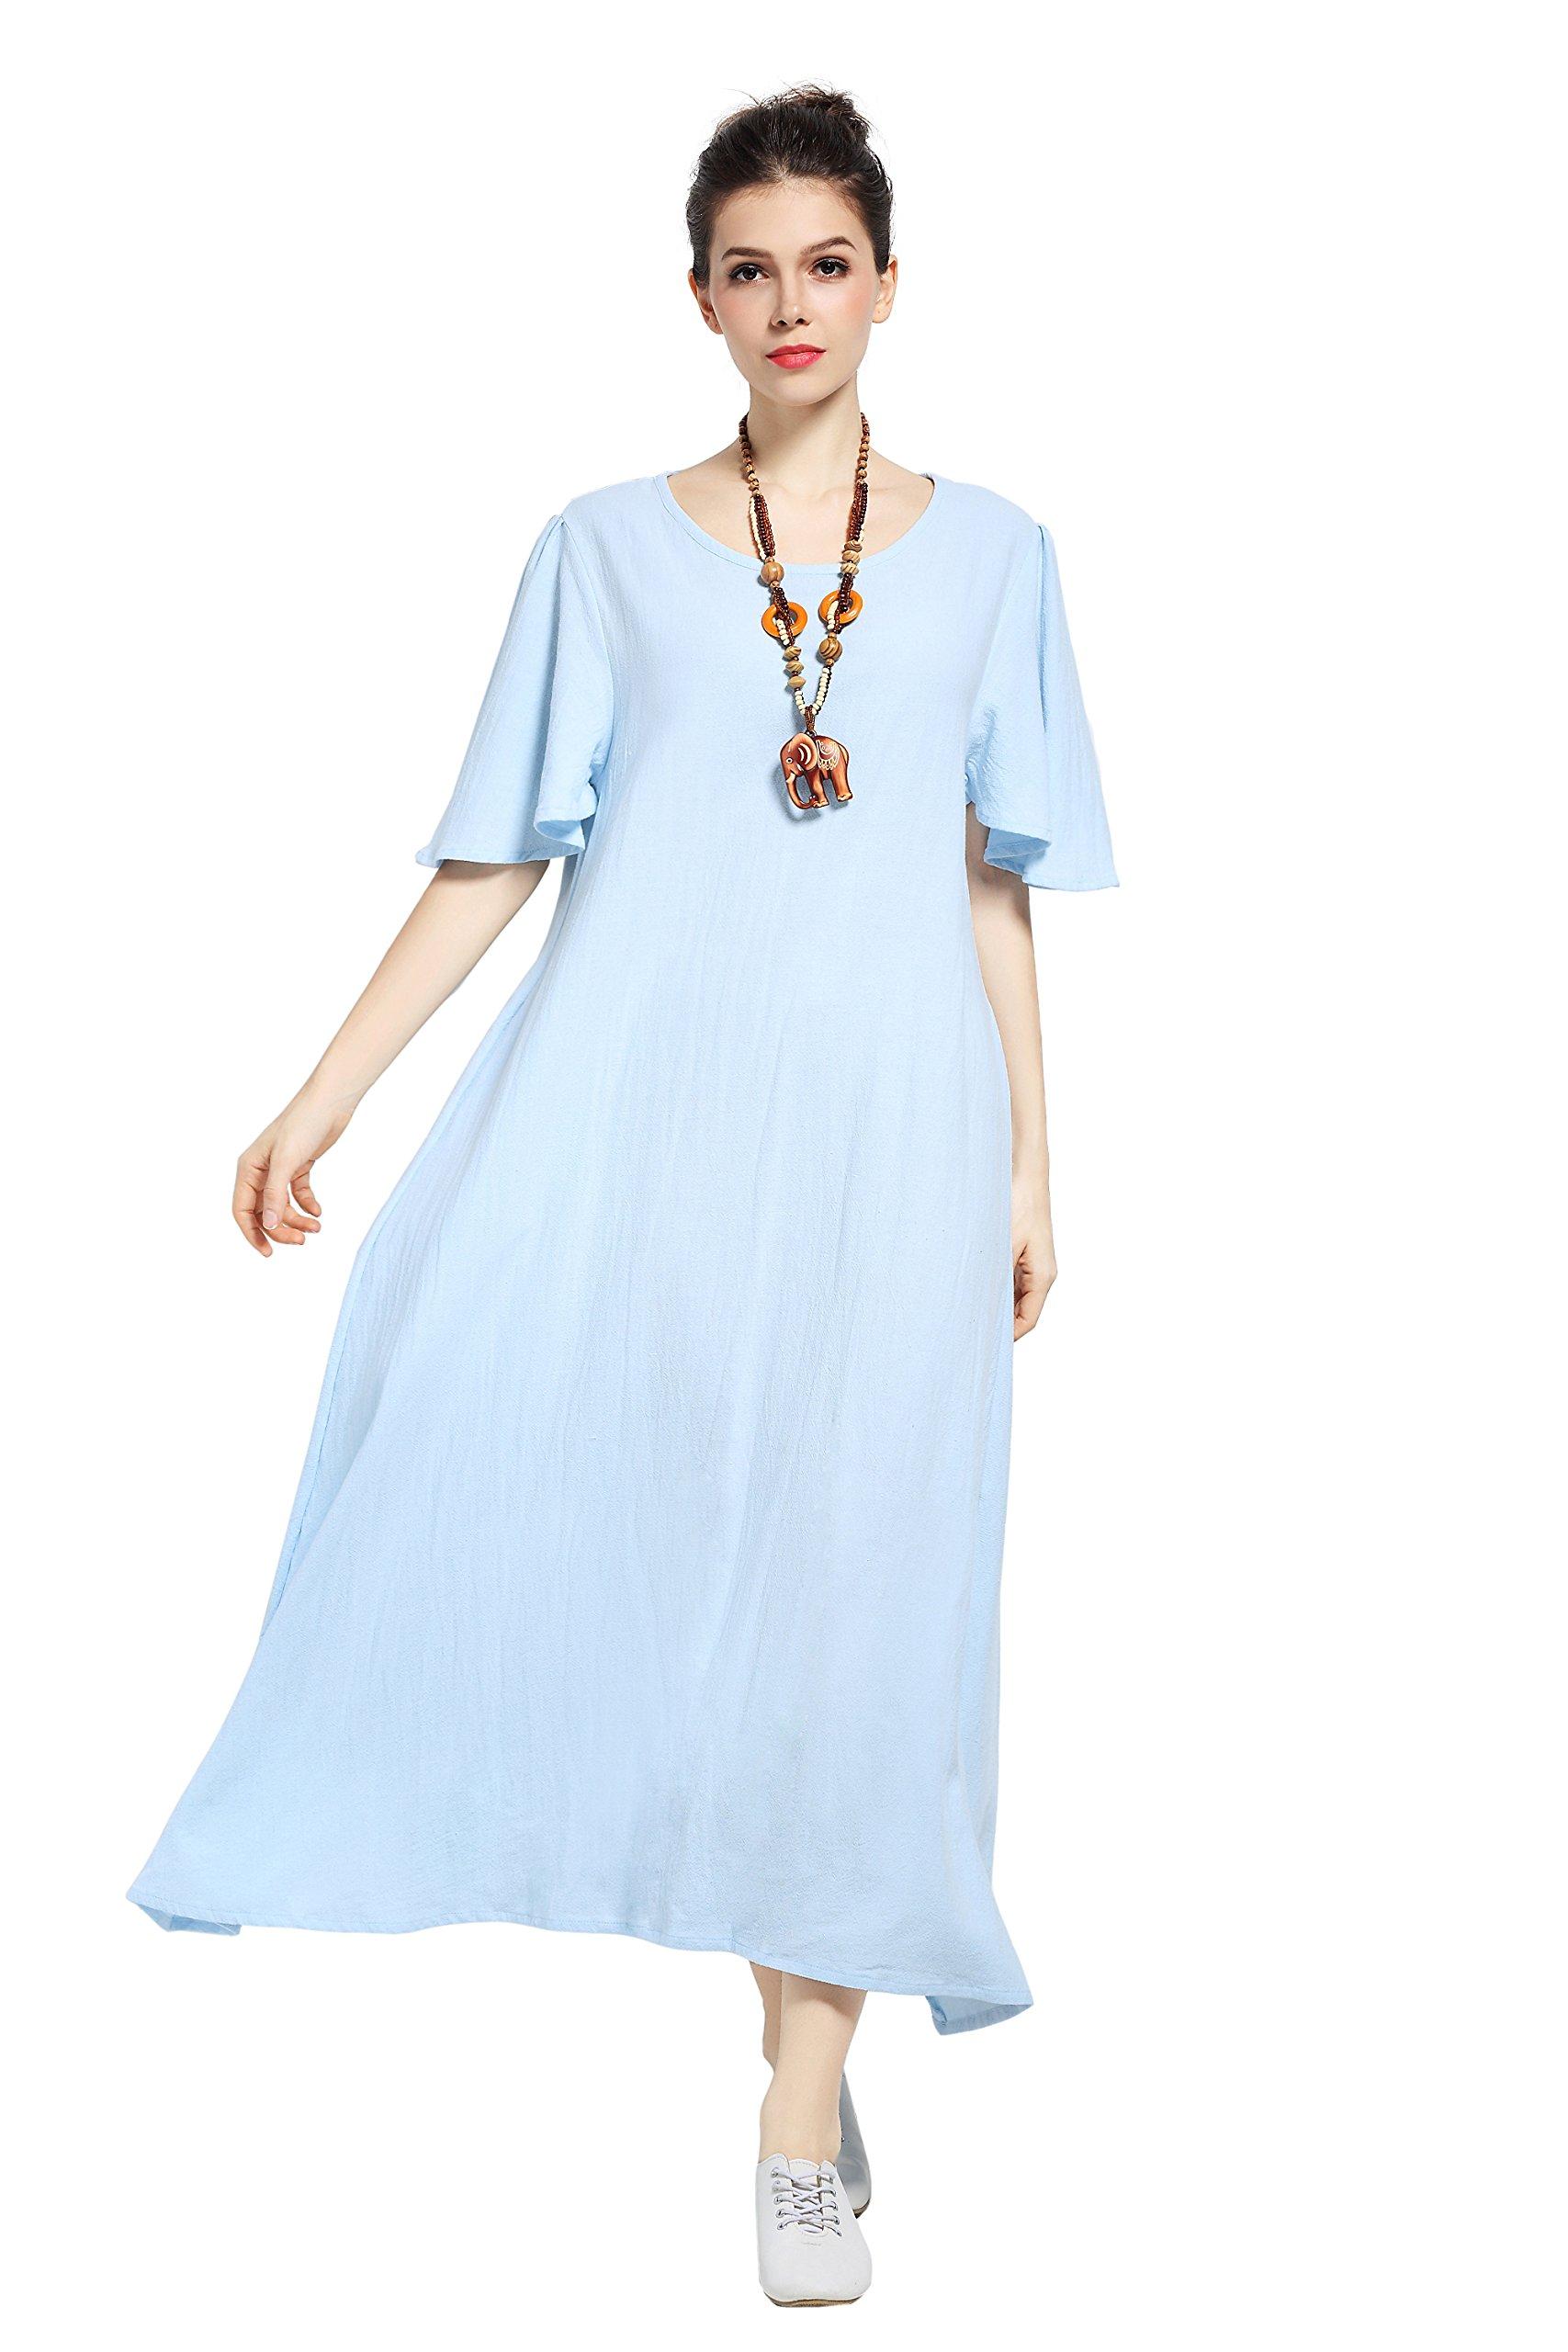 Anysize Ruffle Sleeve Linen&Cotton Spring Summer Plus Size Dress F141A